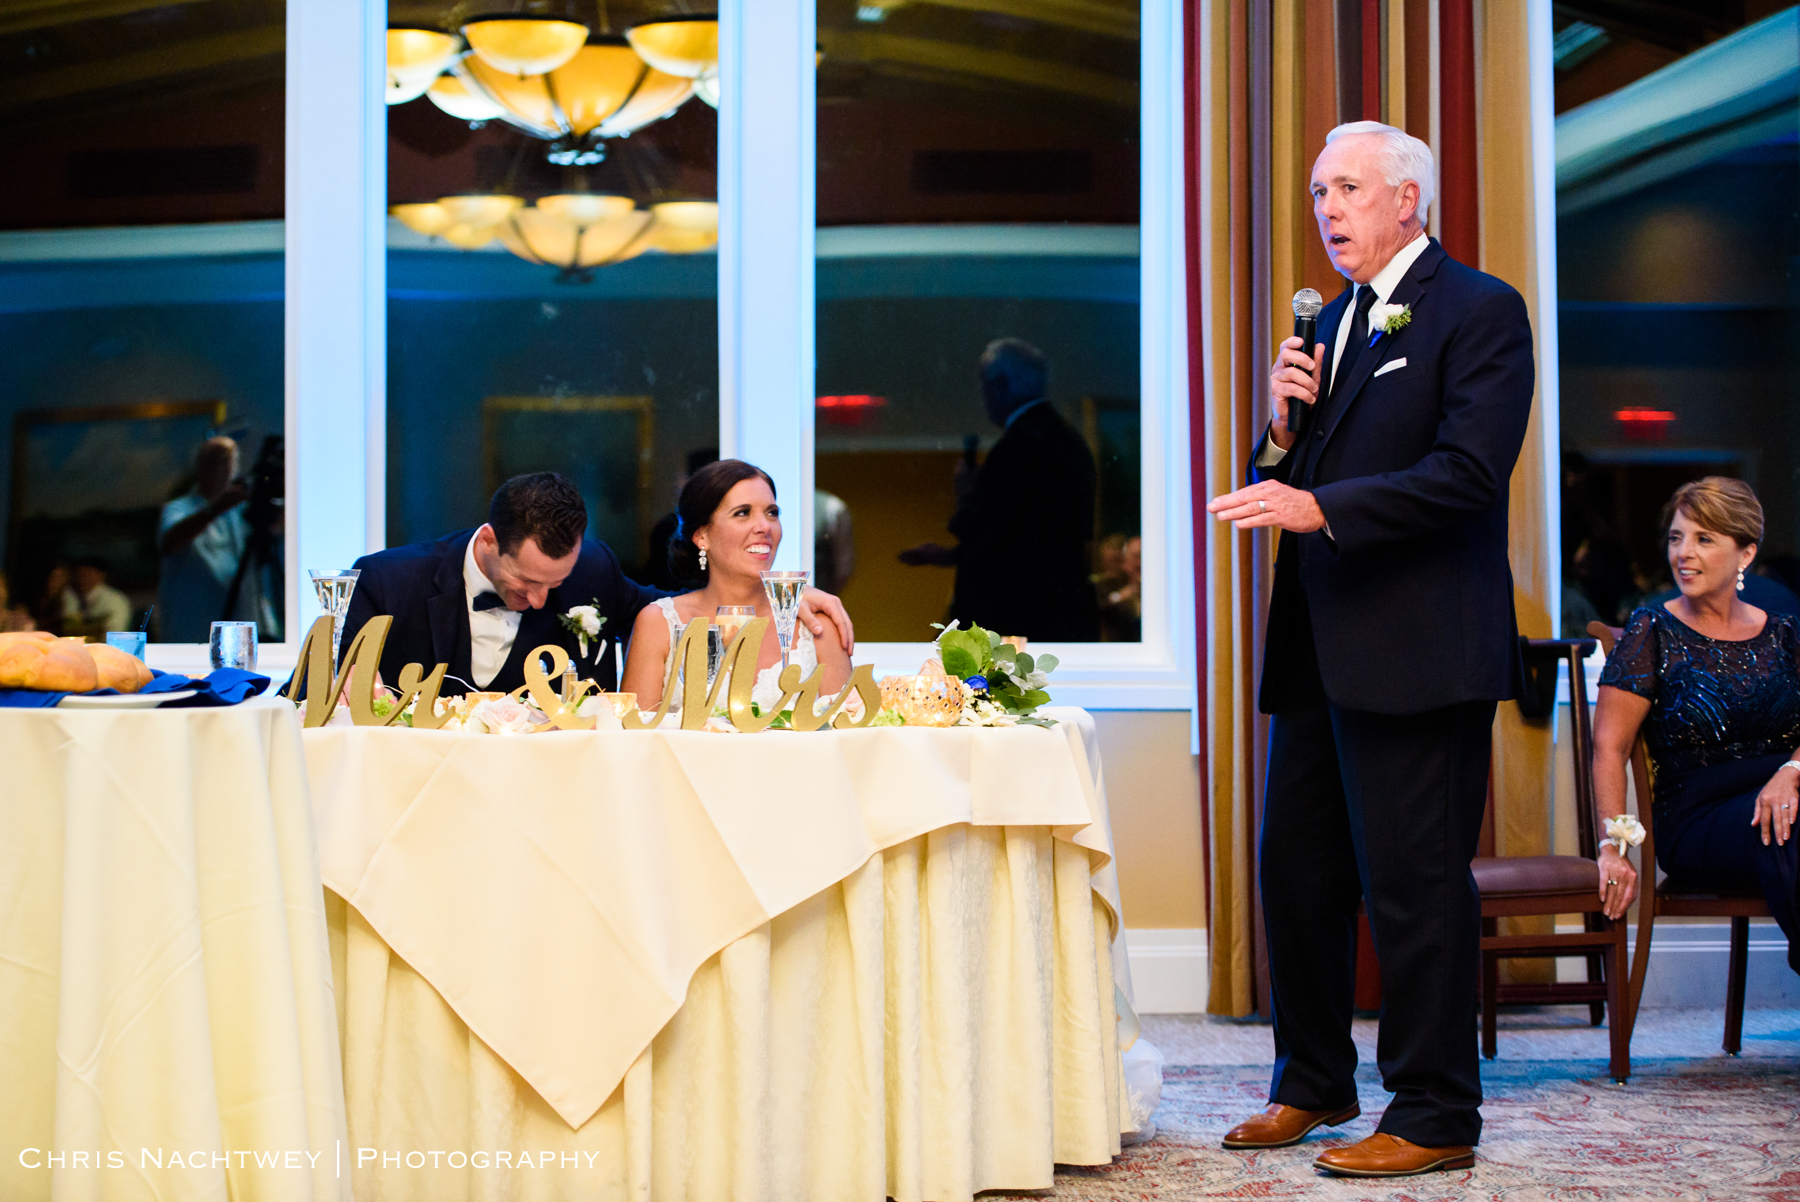 wedding-lake-of-isles-photos-chris-nachtwey-photography-2019-60.jpg